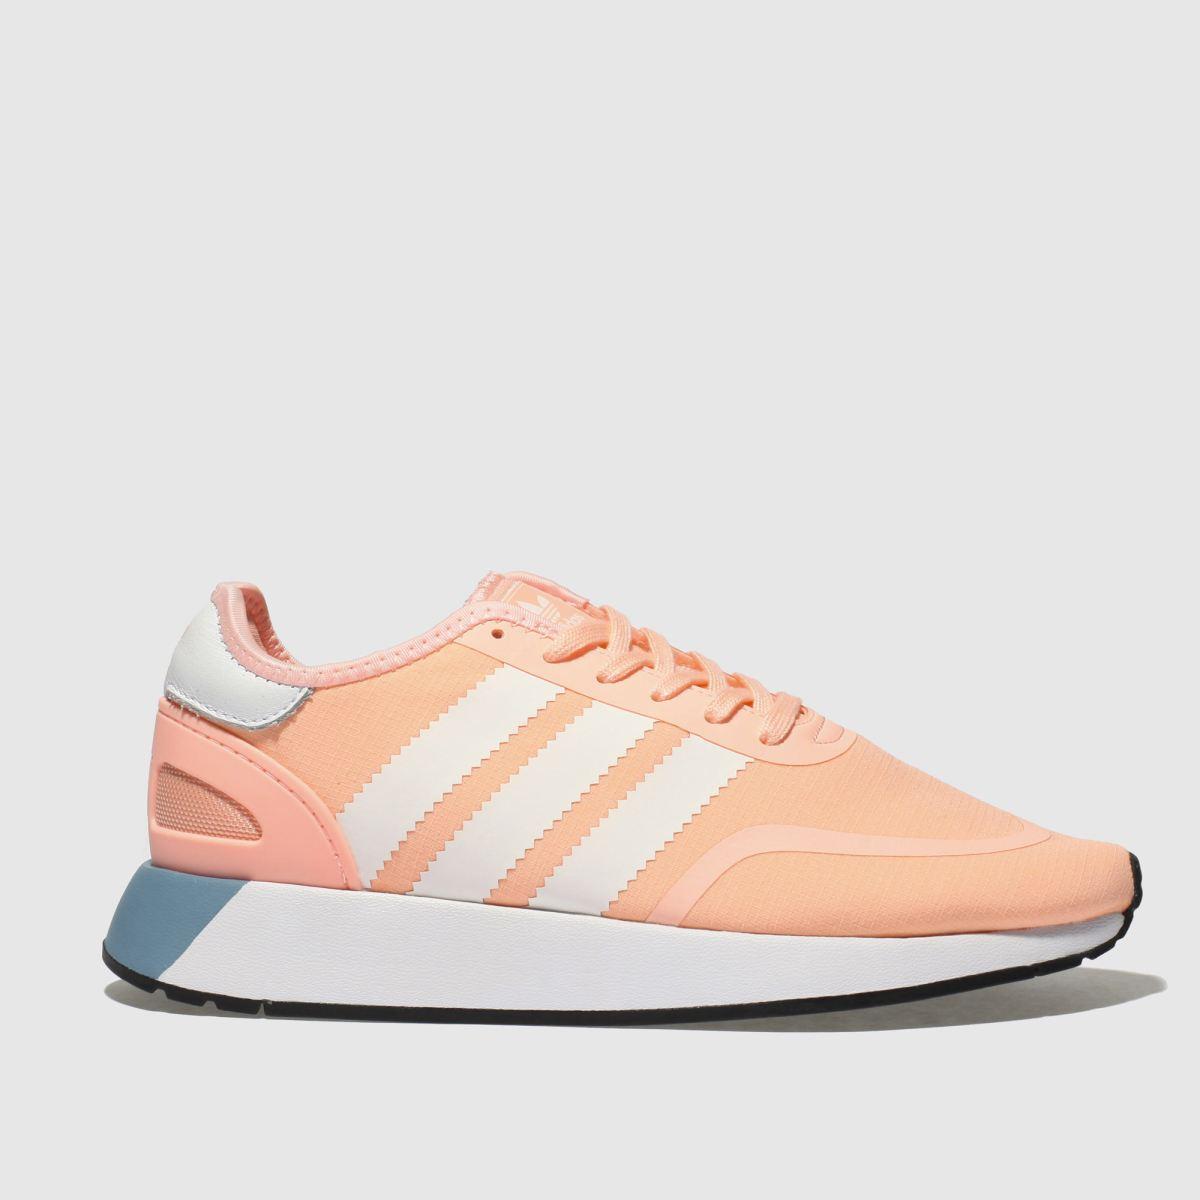 Adidas Pale Pink N-5923 Trainers